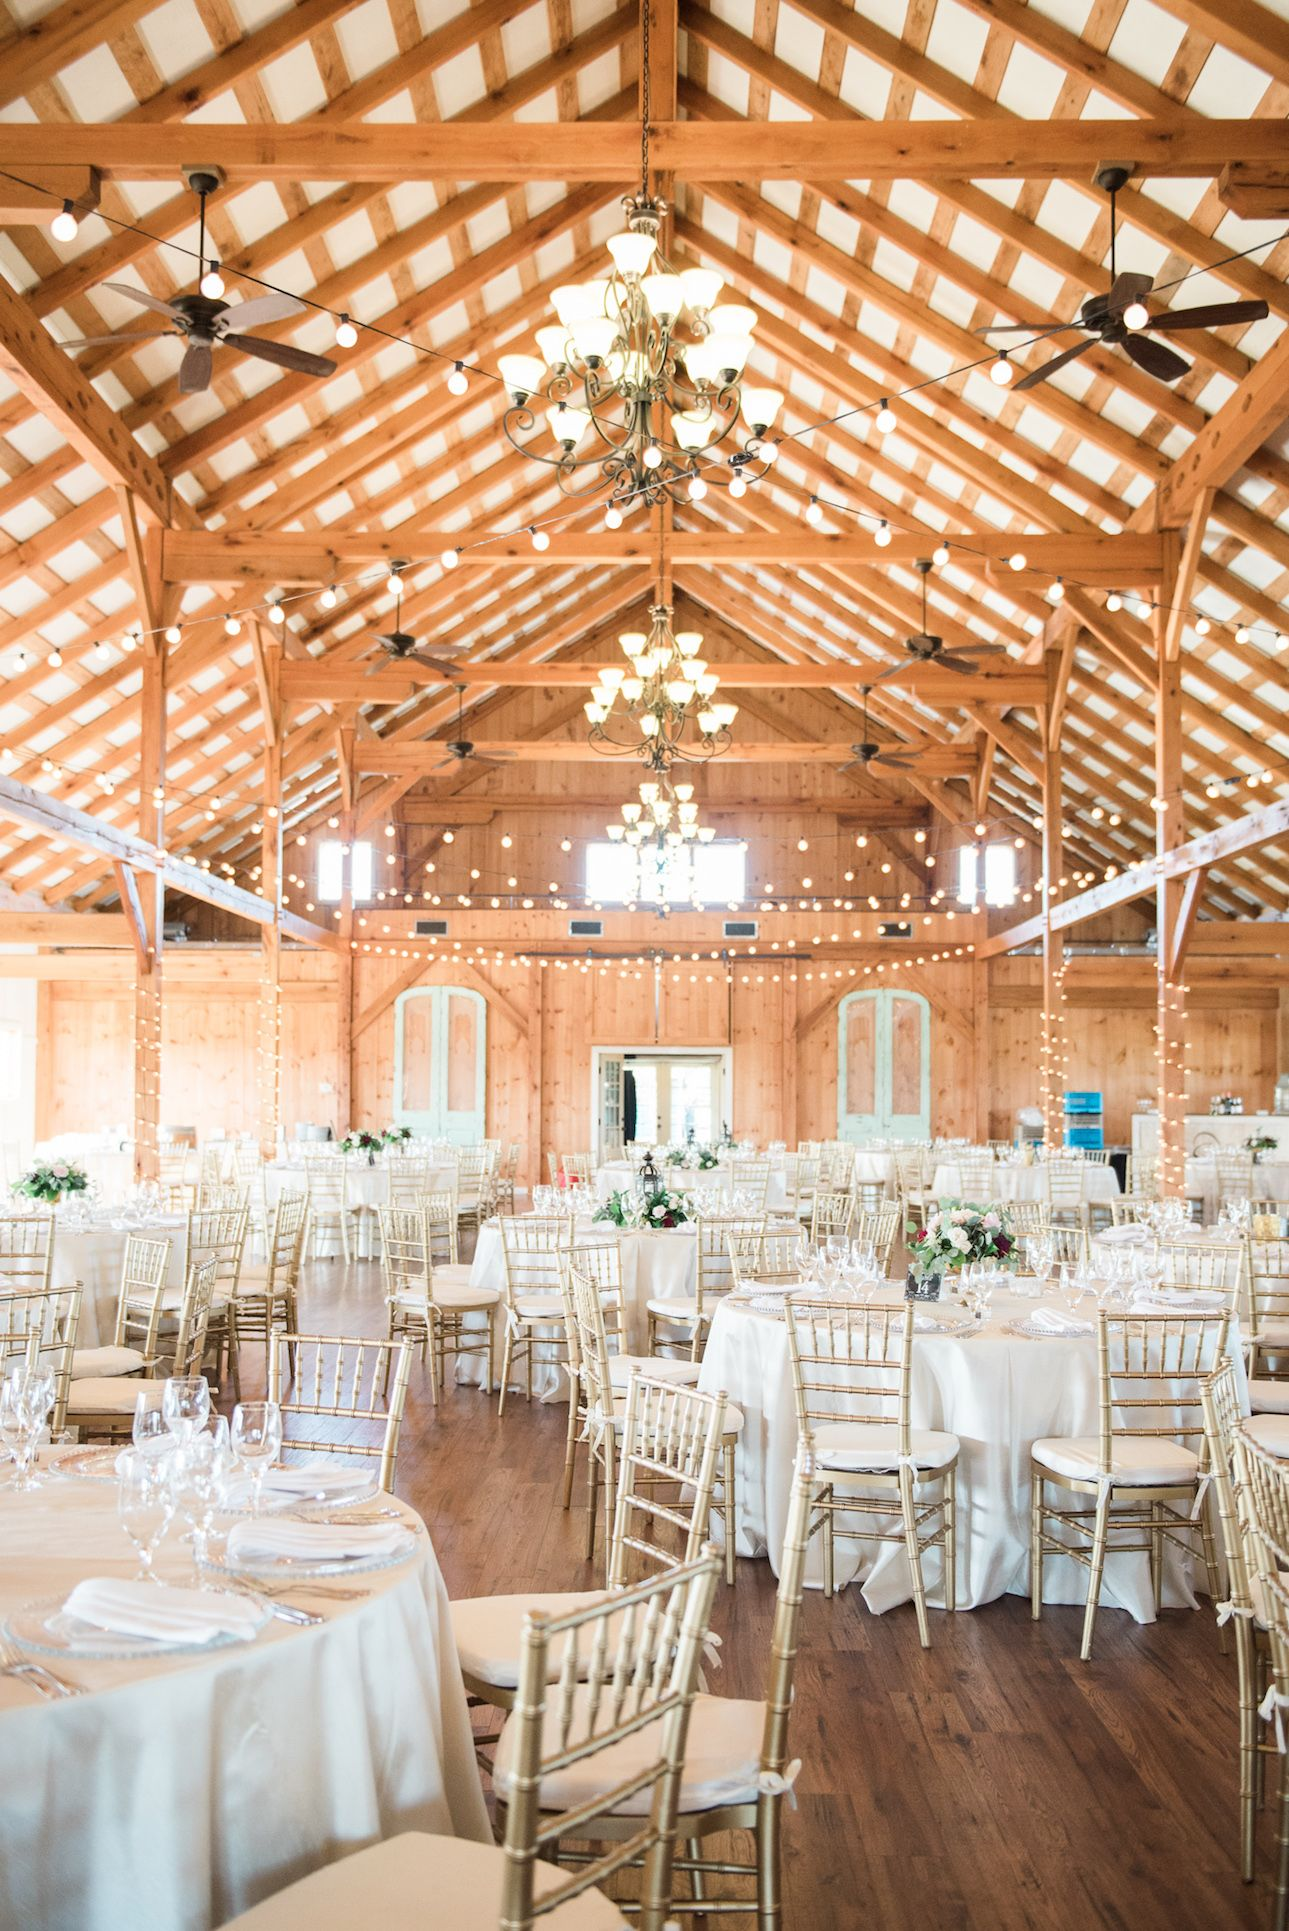 Shadow Creek Wedding.Eddy Ashley Shadow Creek Weddings And Events Barn Wedding